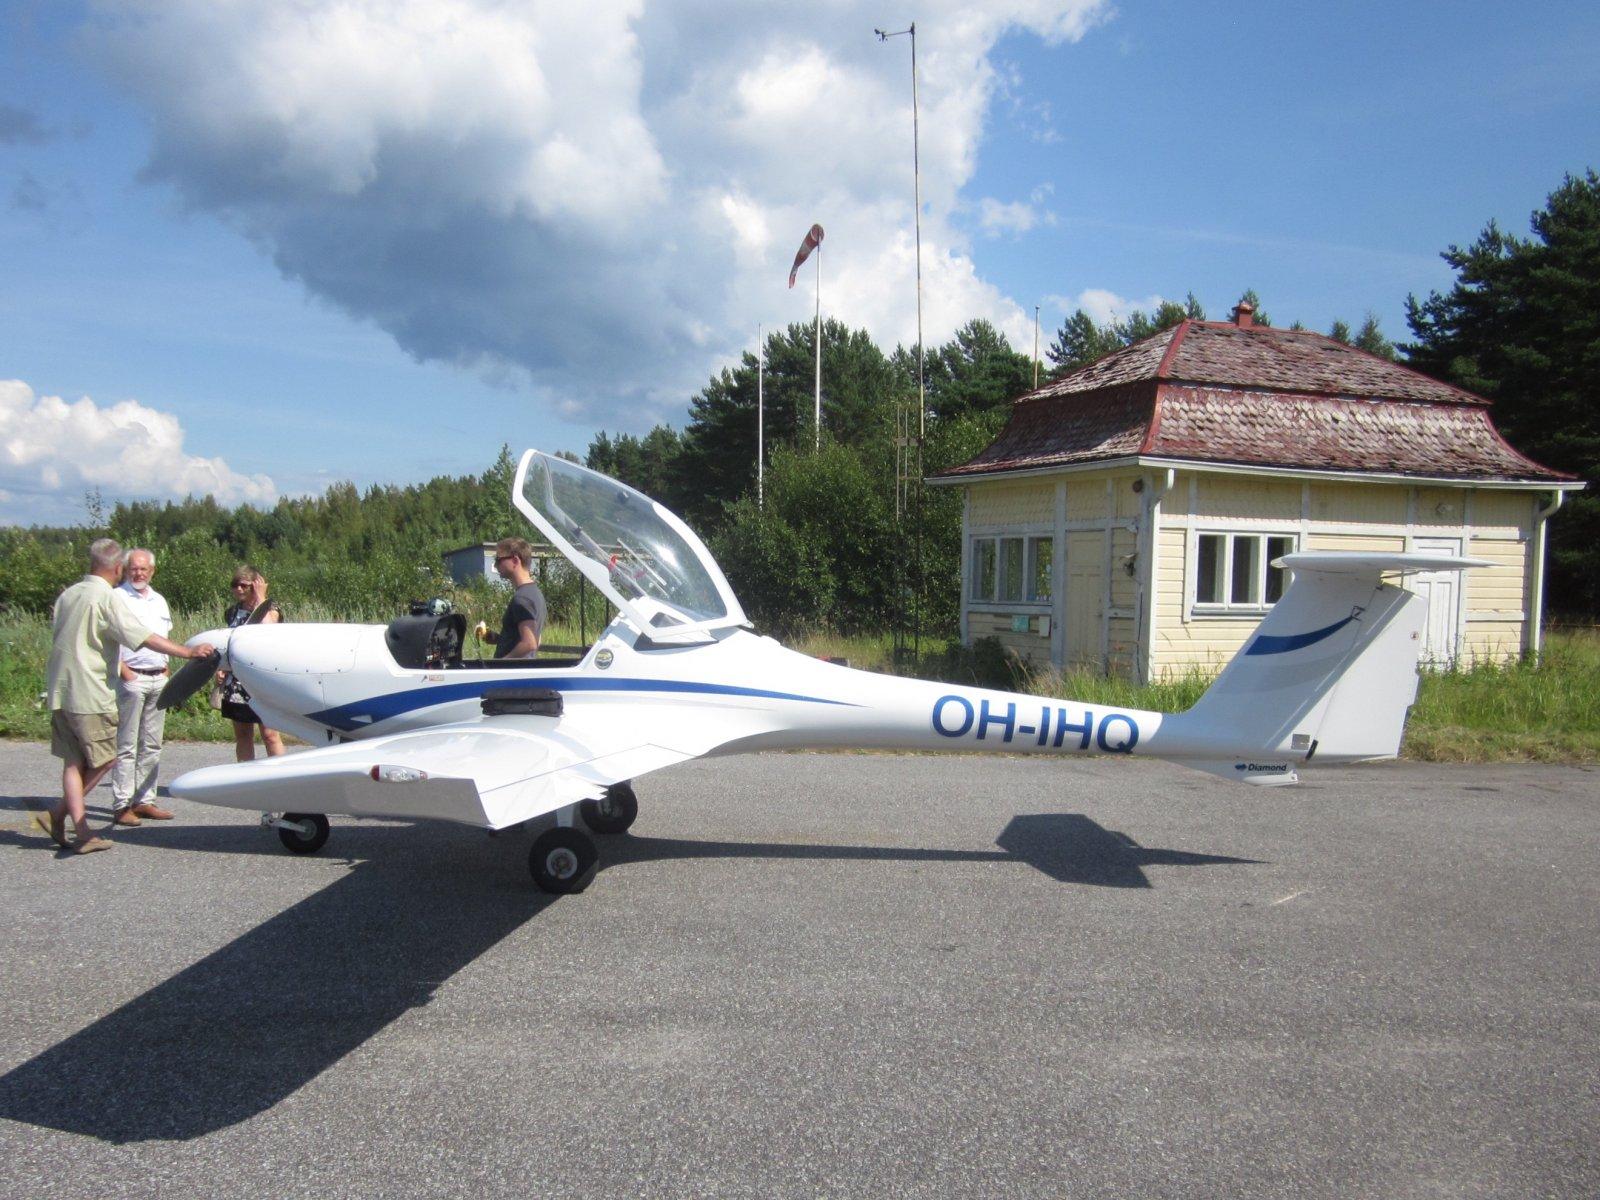 Diamond DA-20-A1 Katana OH-IHQ EFHN 2014-08-08